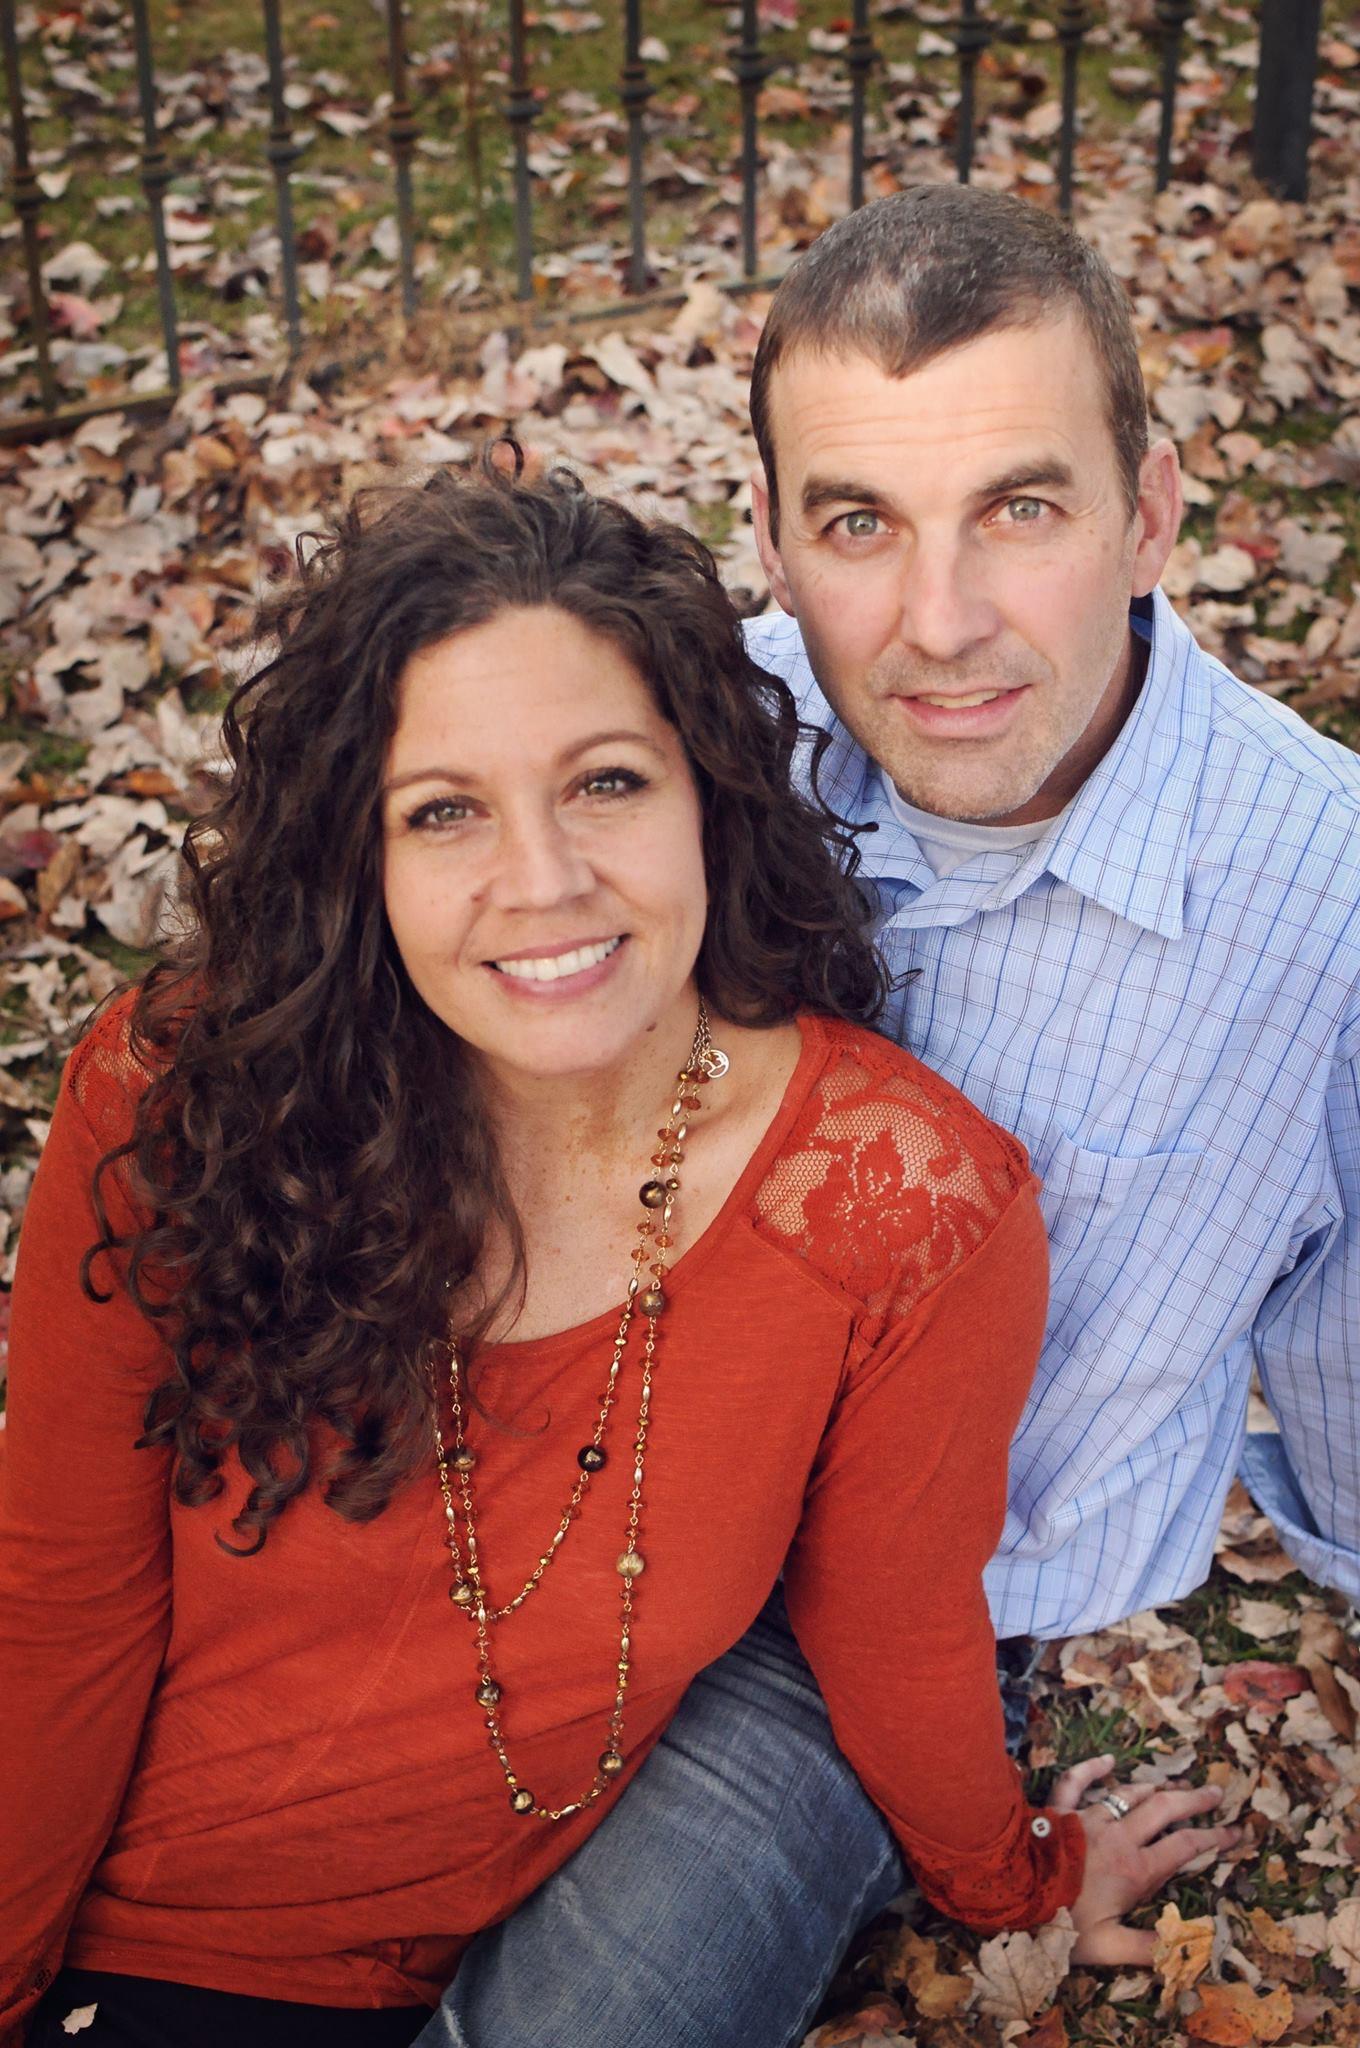 amy and scott.JPG